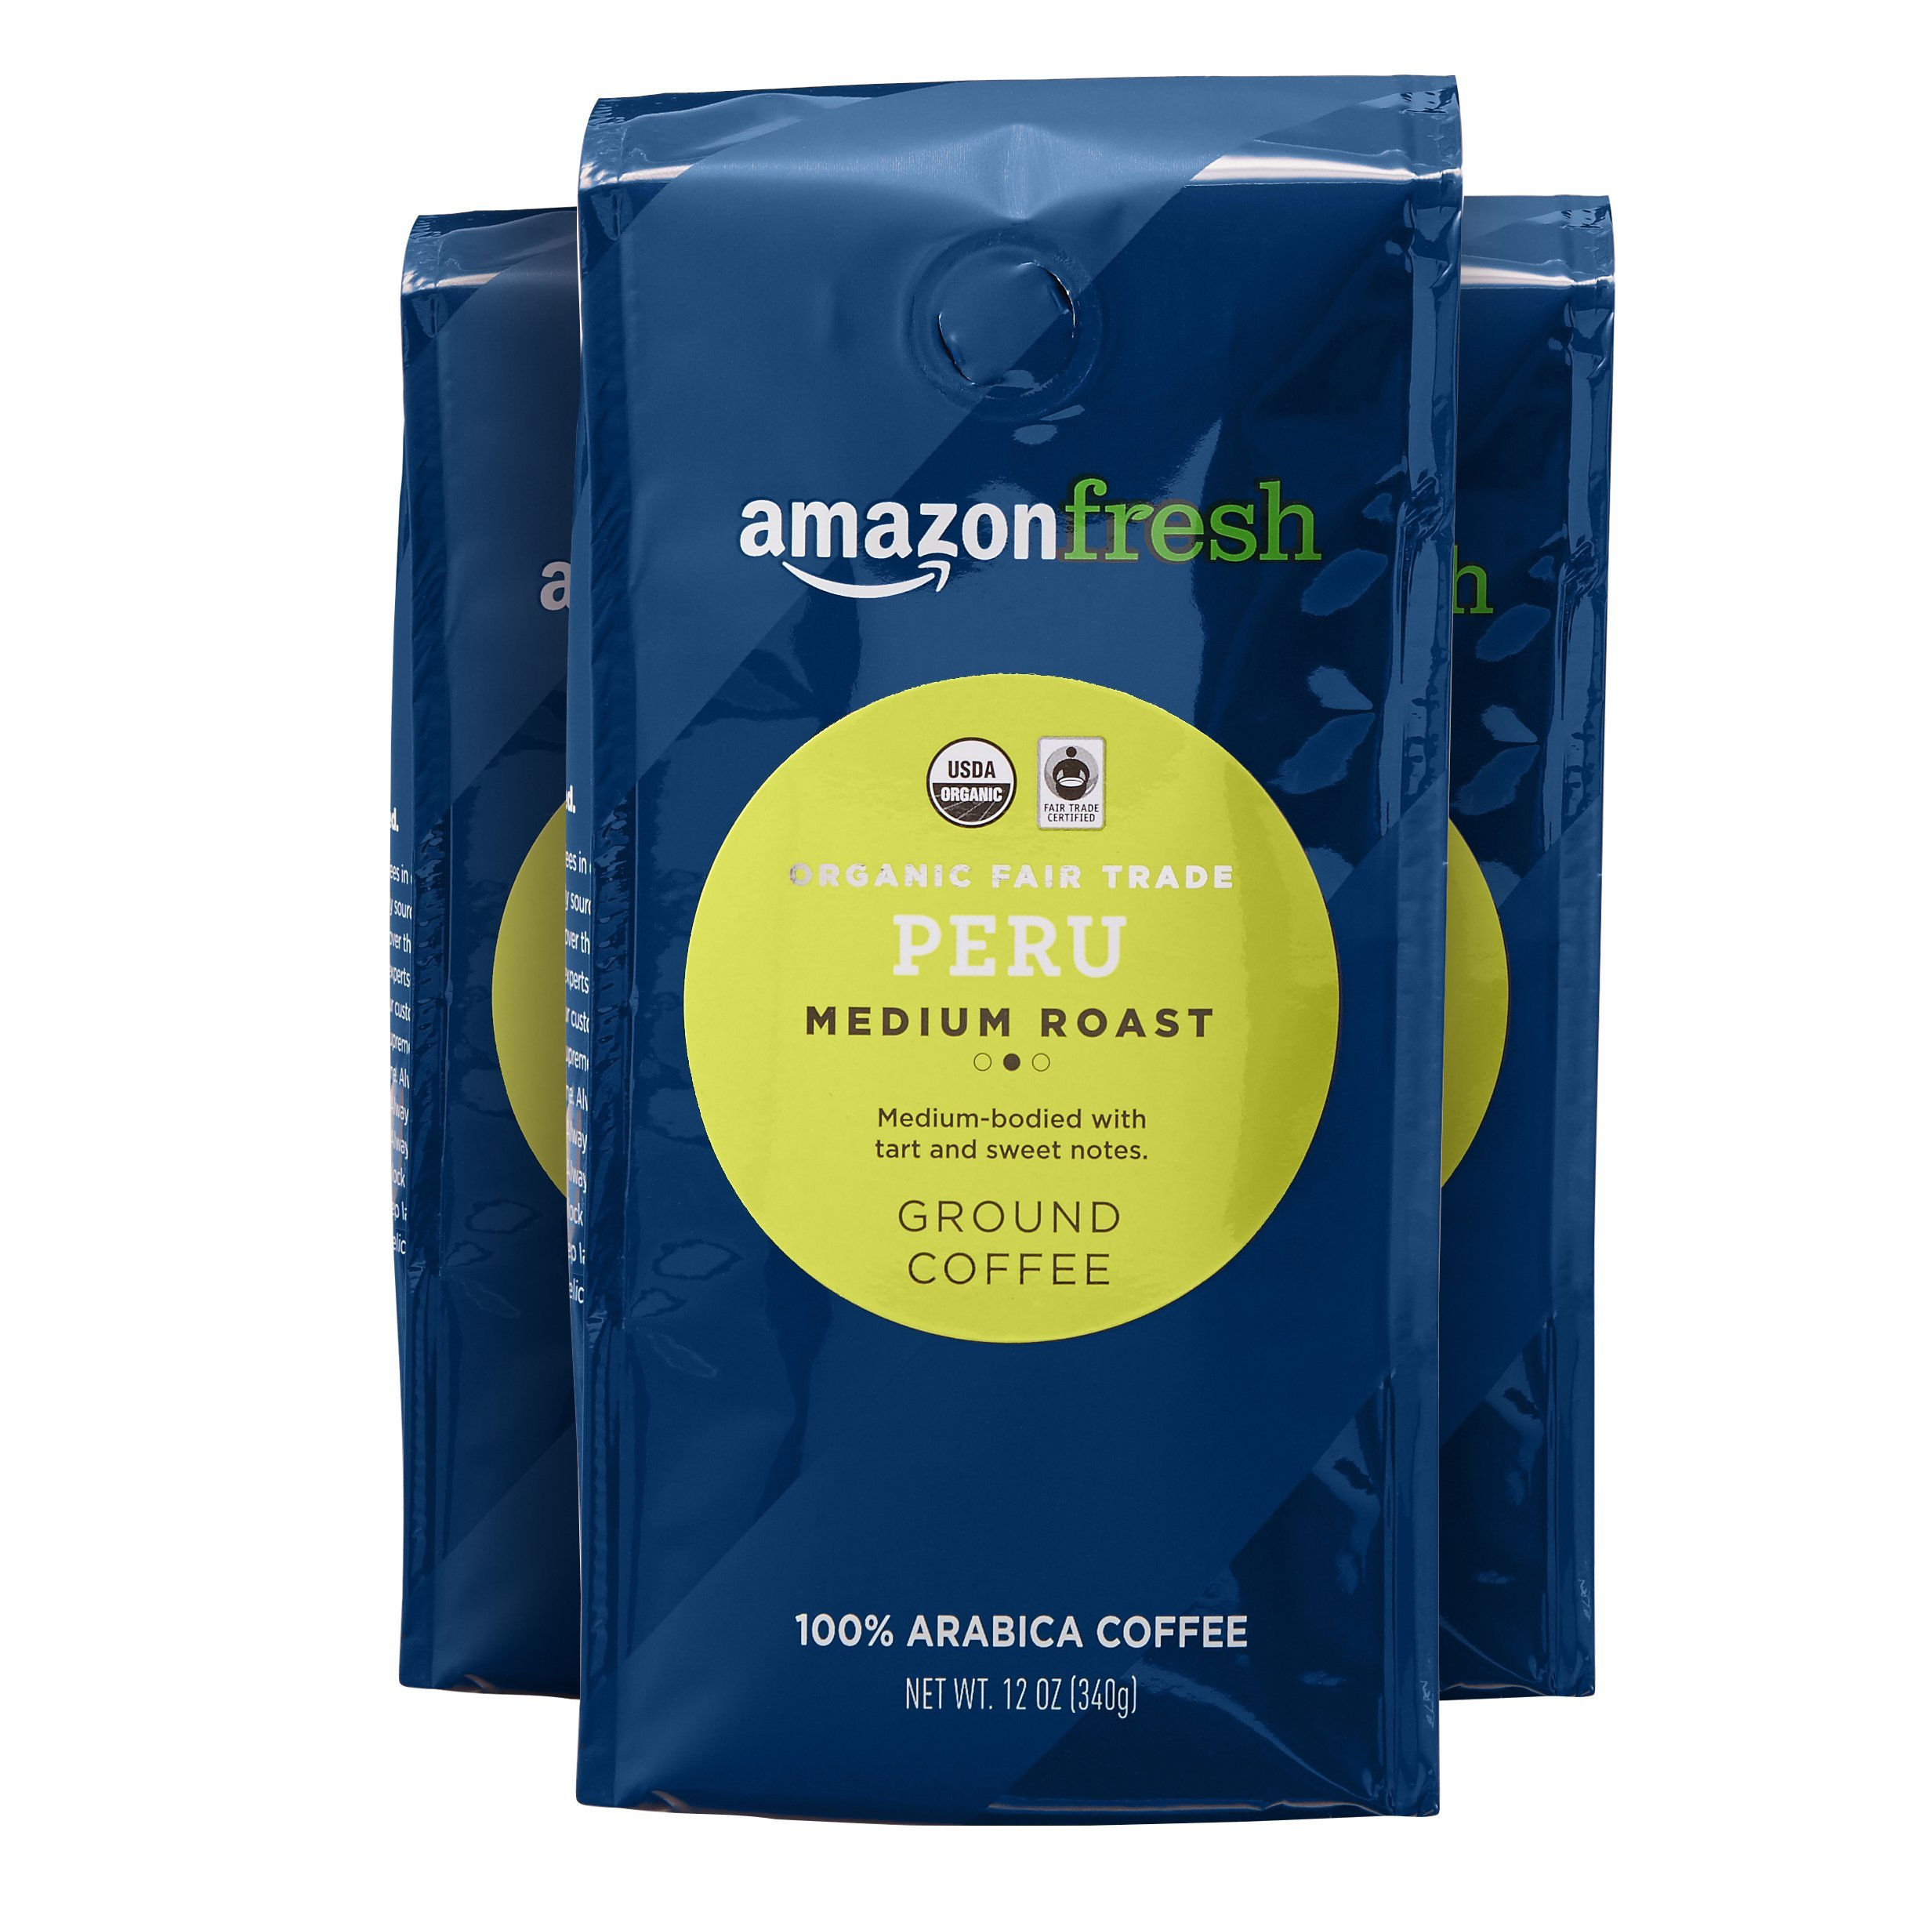 AmazonFresh Organic Fair Trade Peru Ground Coffee, Medium Roast, 12 Ounce (Pack of 3) by AmazonFresh